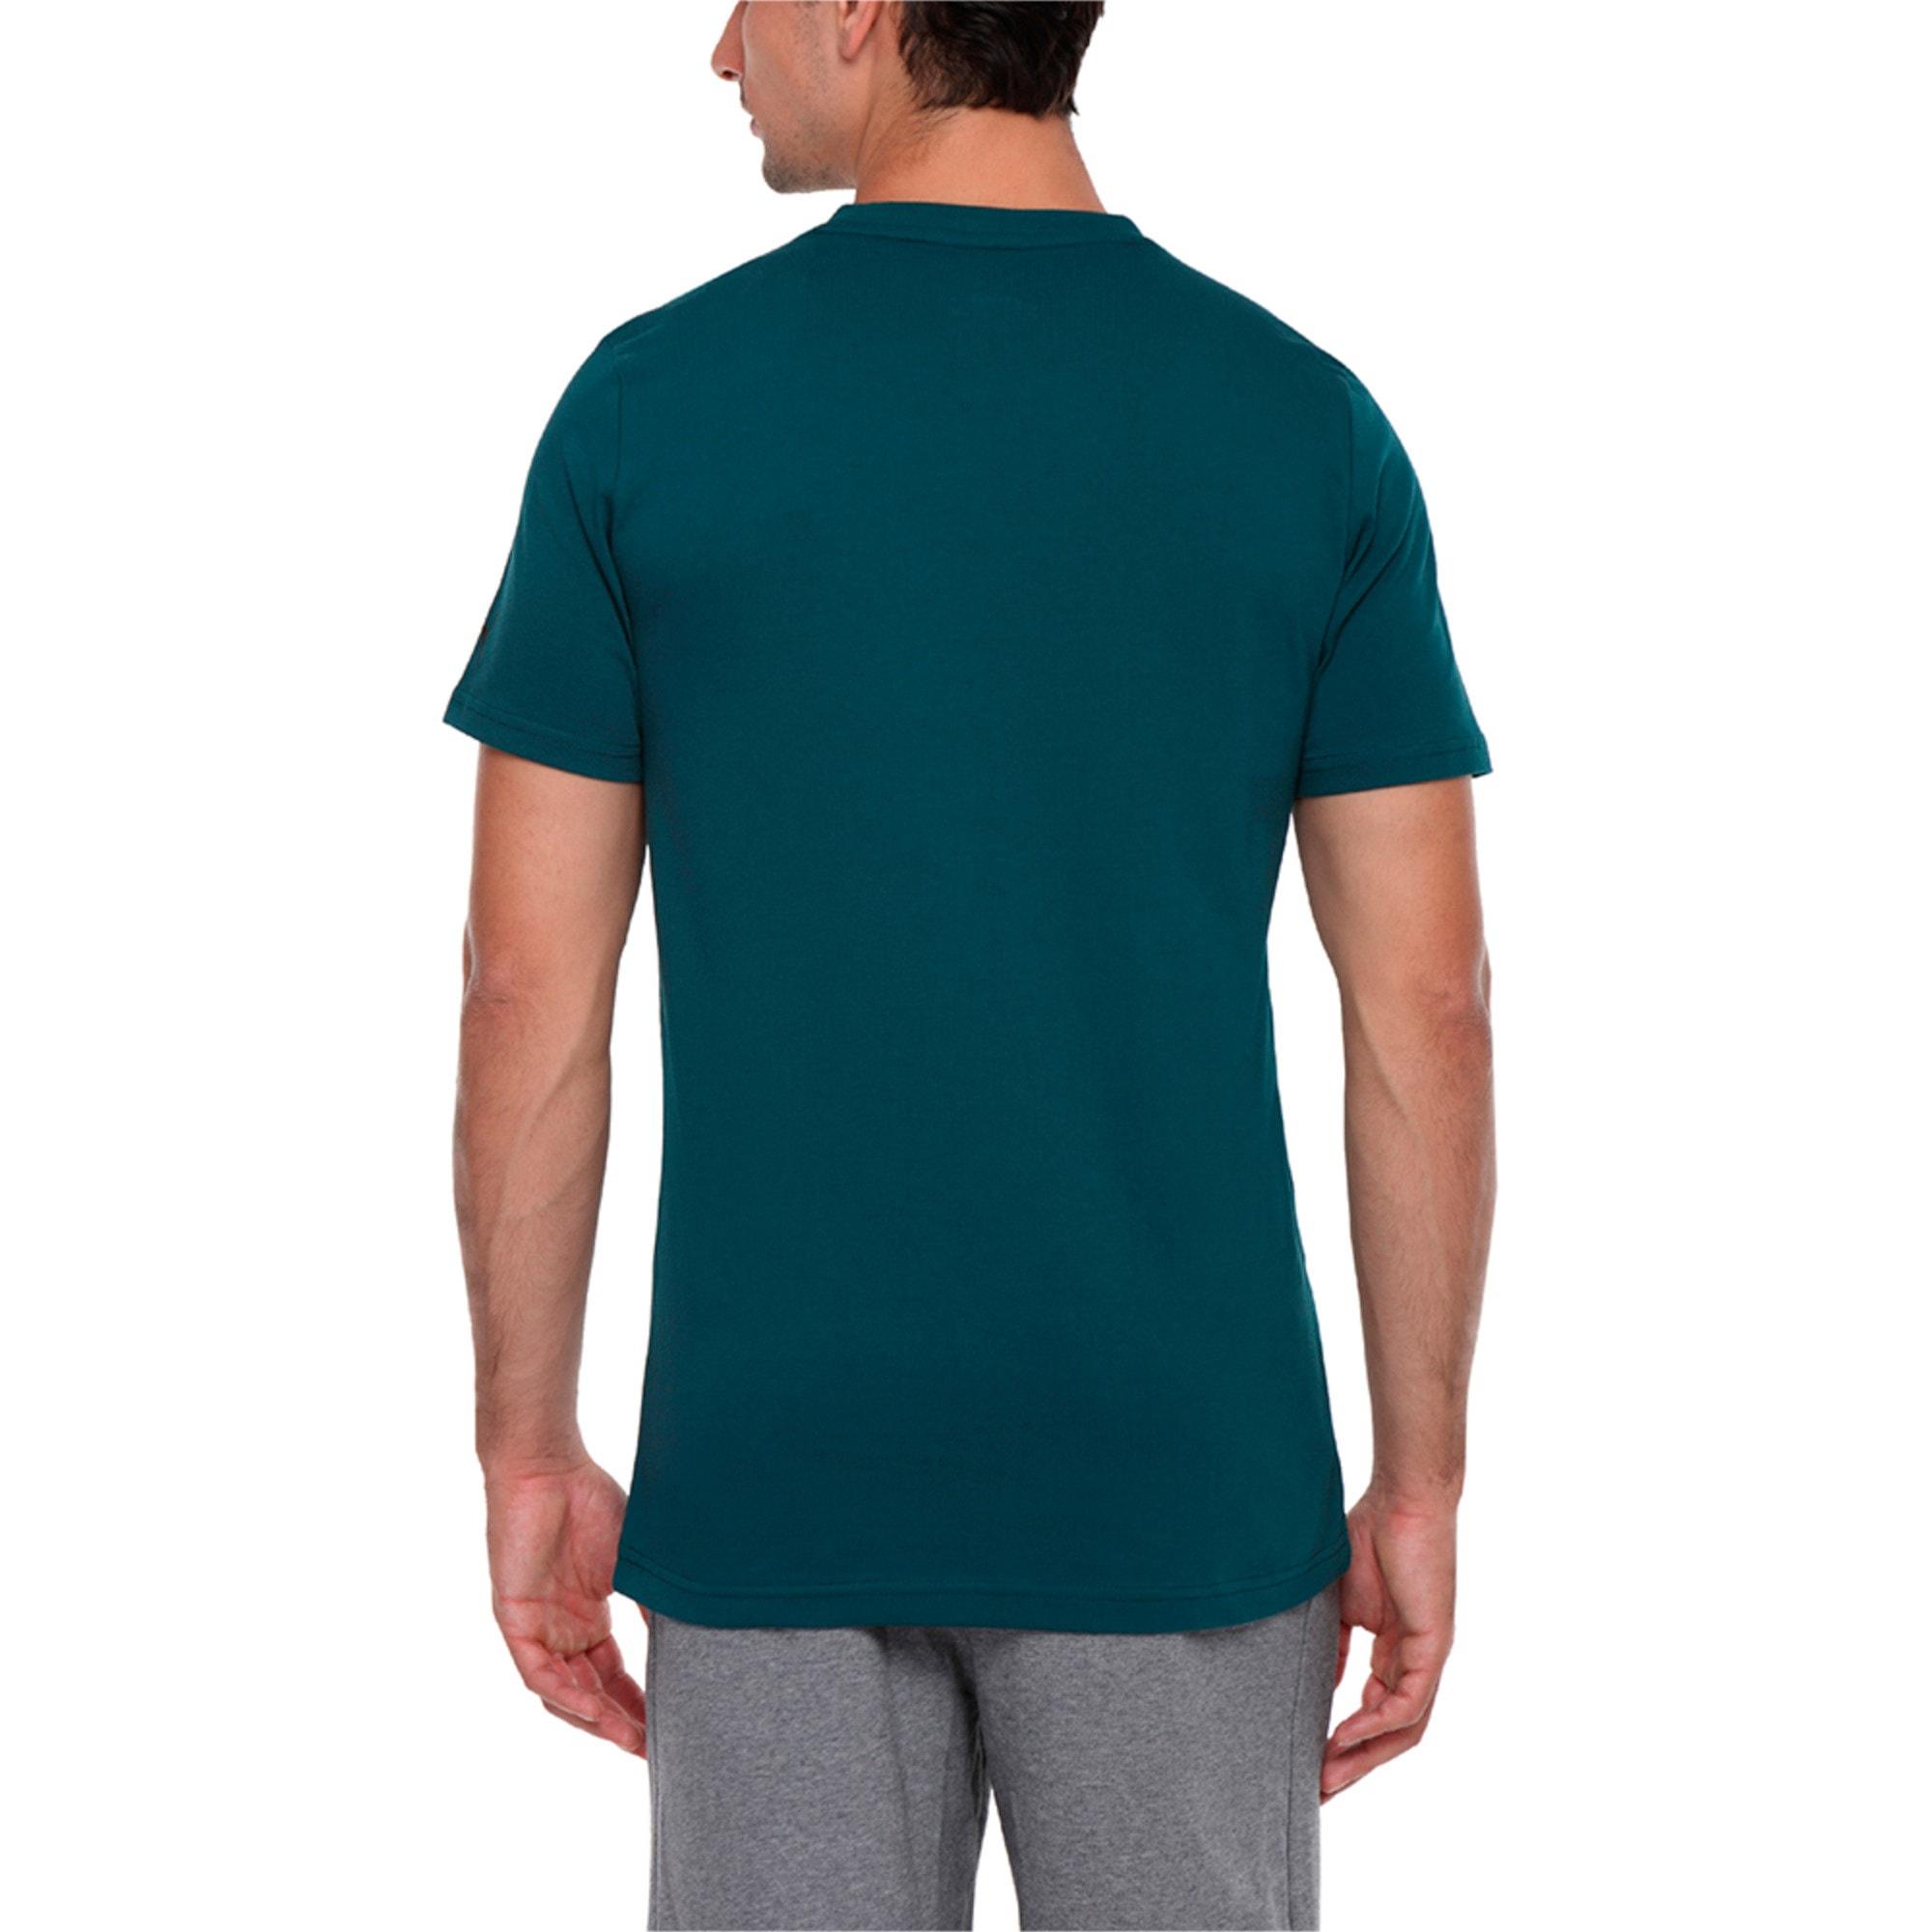 Thumbnail 3 of MERCEDES AMG PETRONAS Men's Logo T-Shirt, Deep Teal, medium-IND